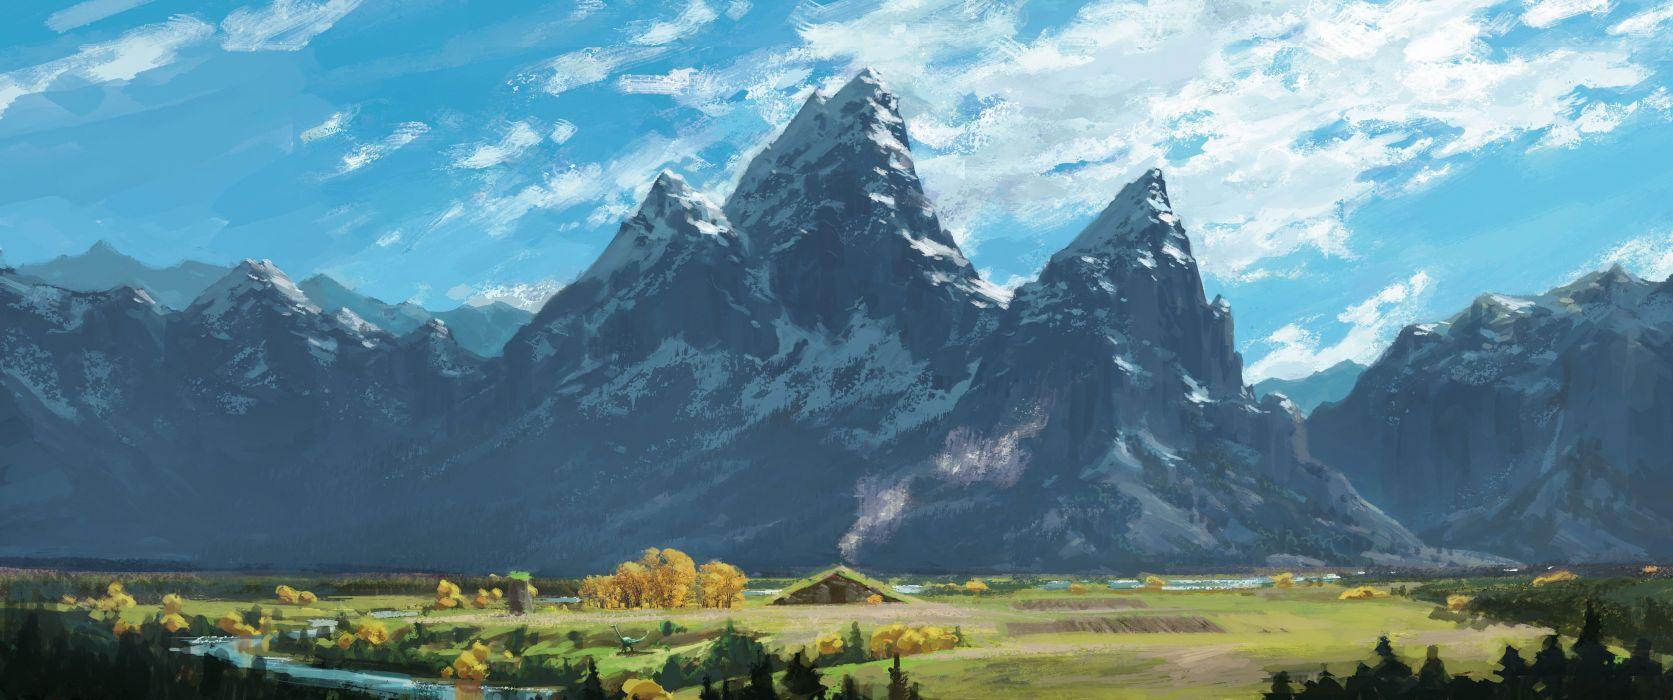 Wonderful Wallpaper Mountain Animated - e6bc93381a5b1a95ed332de43dd0ac9e-700  Perfect Image Reference_172460.jpg